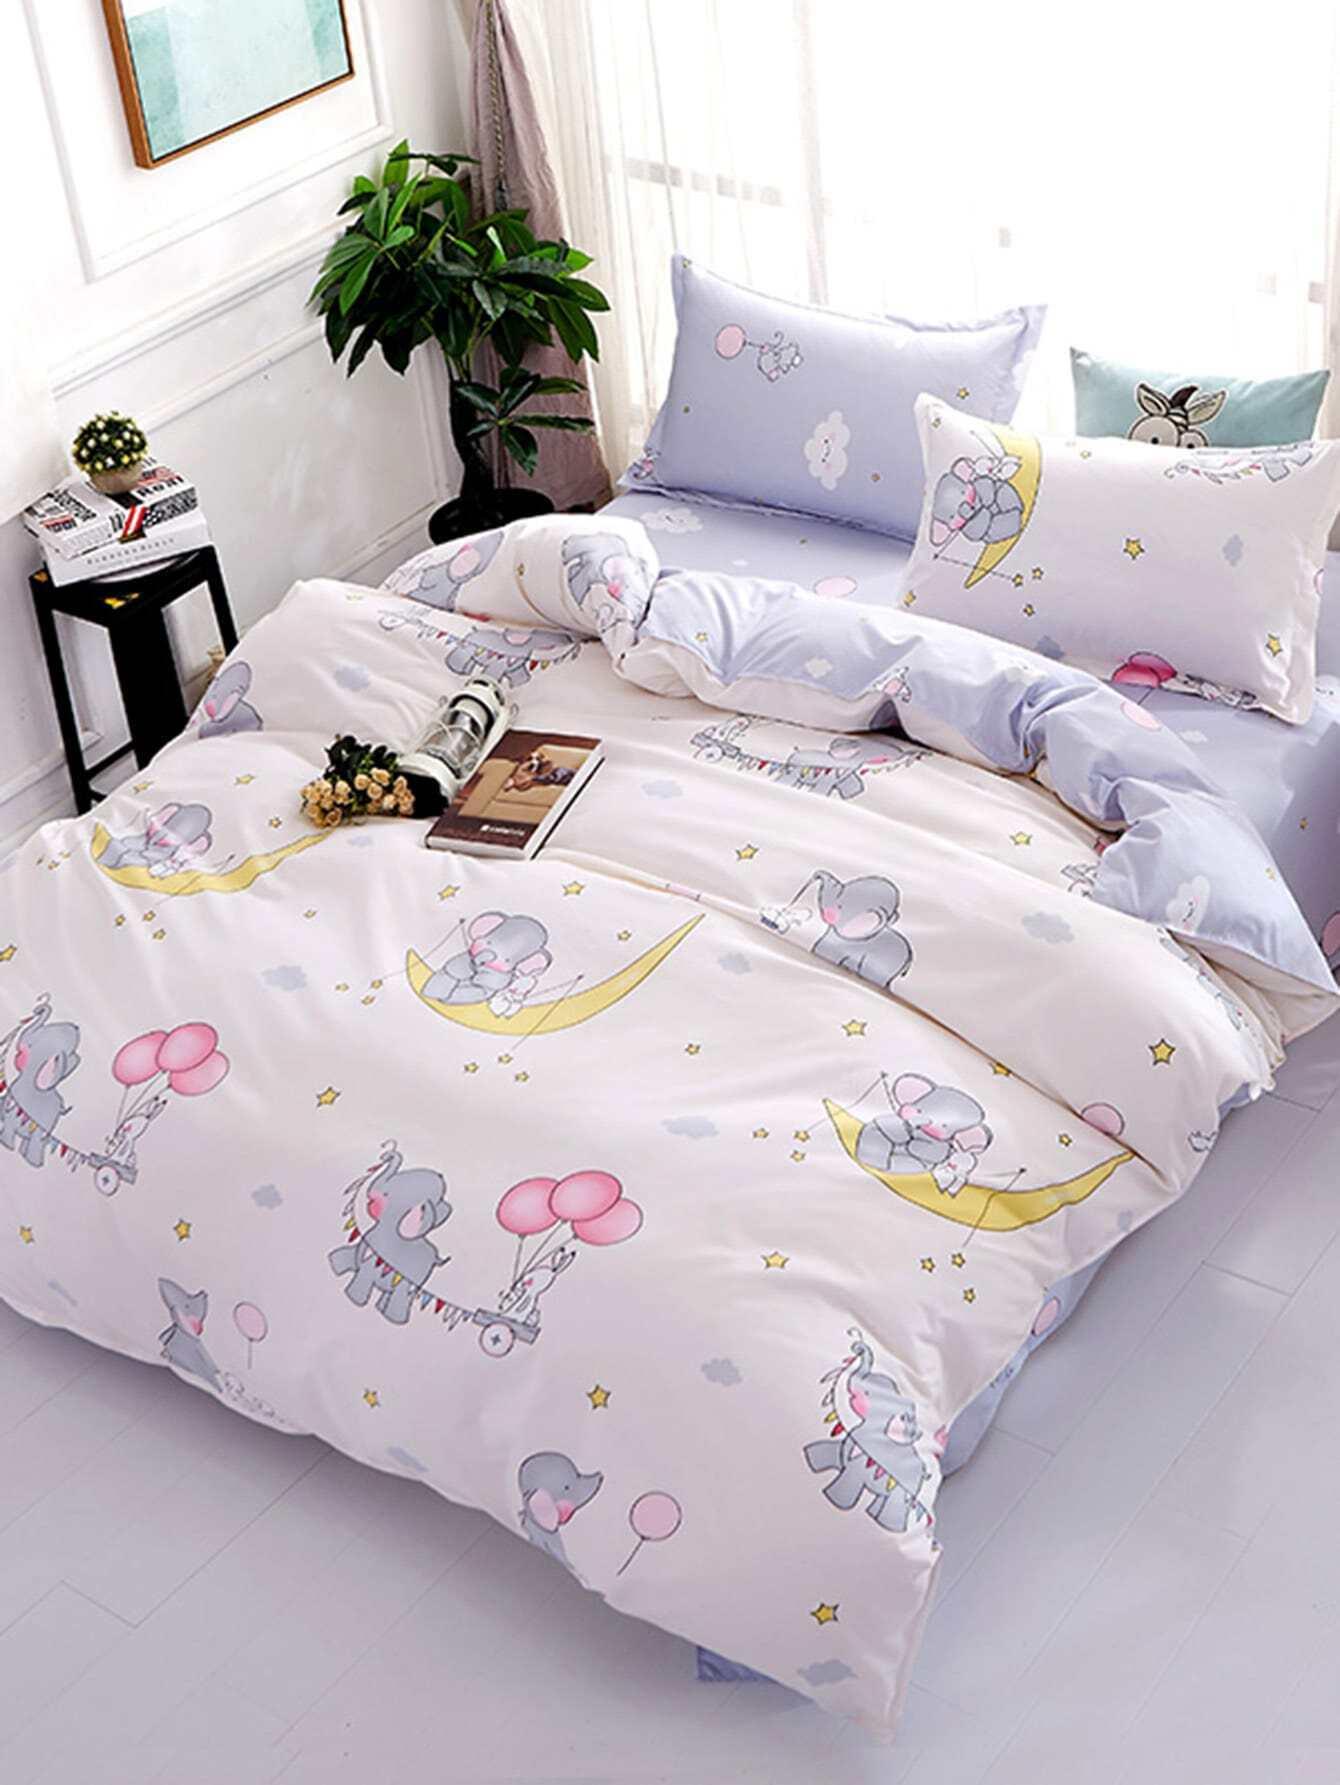 2.0m 4Pcs Cartoon Print Bed Sheet Set бра leds c4 bed 05 2830 34 34